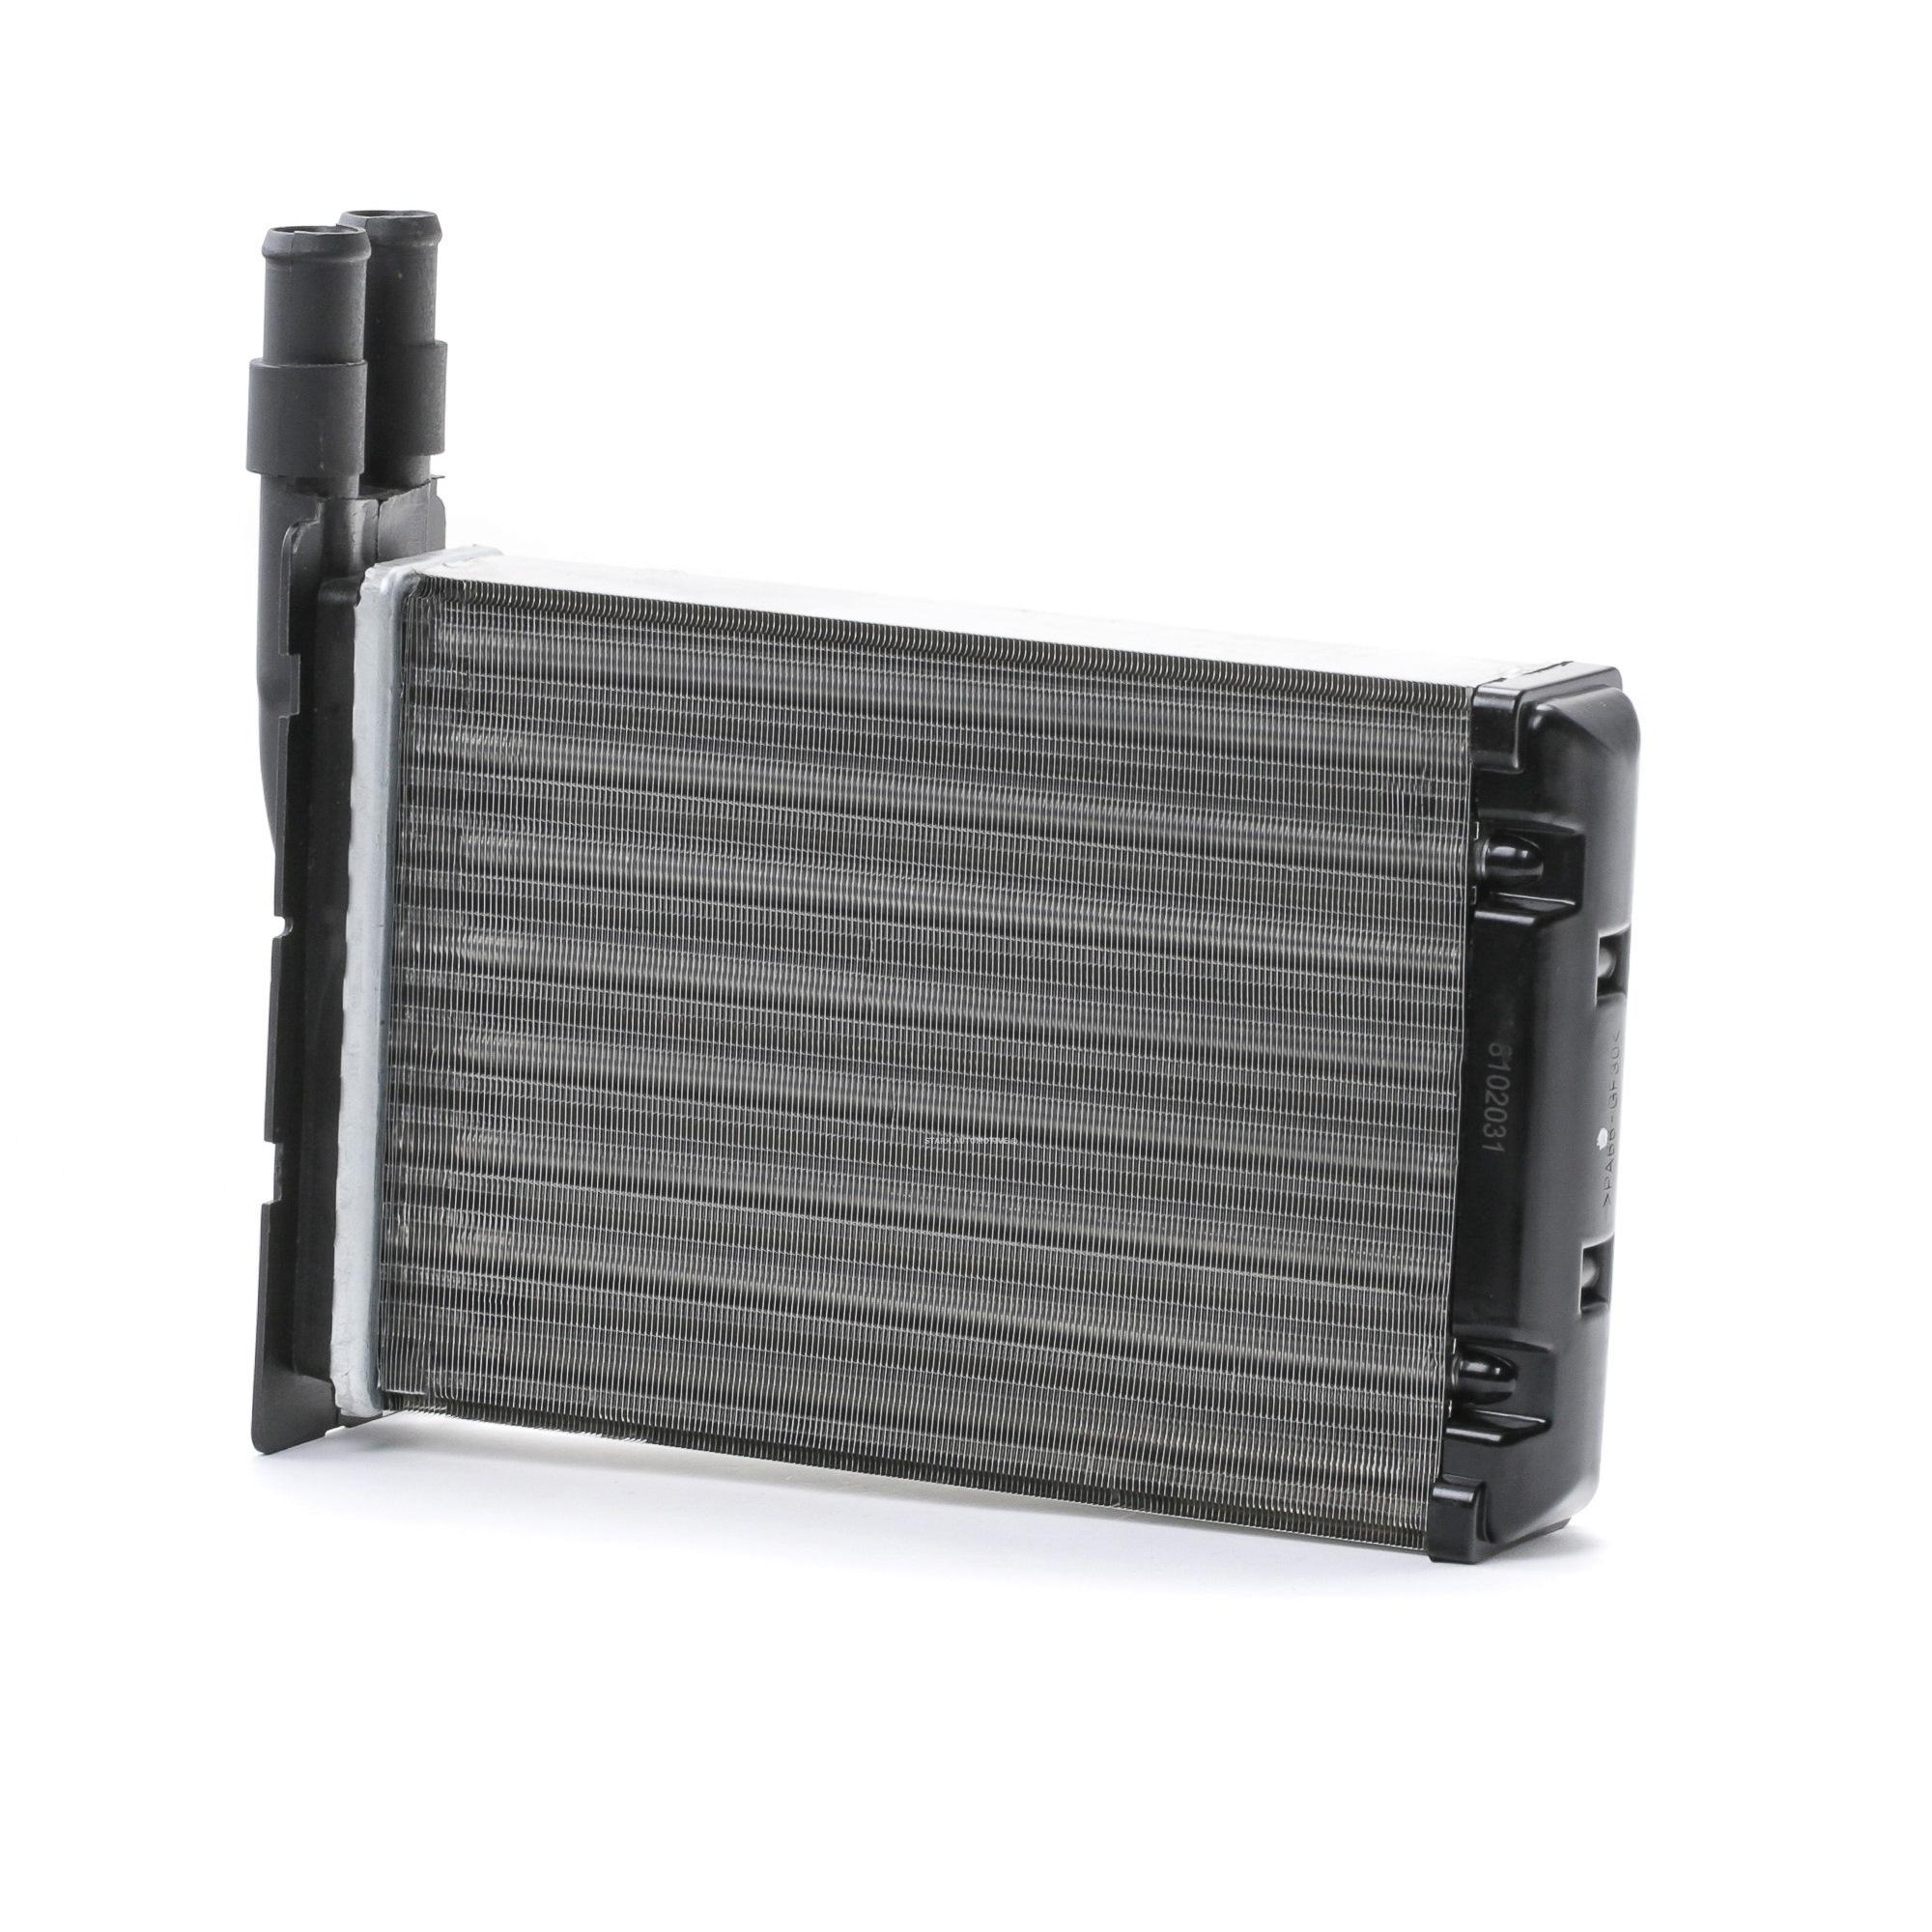 STARK SKHE-0880041 (Aluminium, Matière plastique) : Chauffage / ventilation Twingo c06 2009